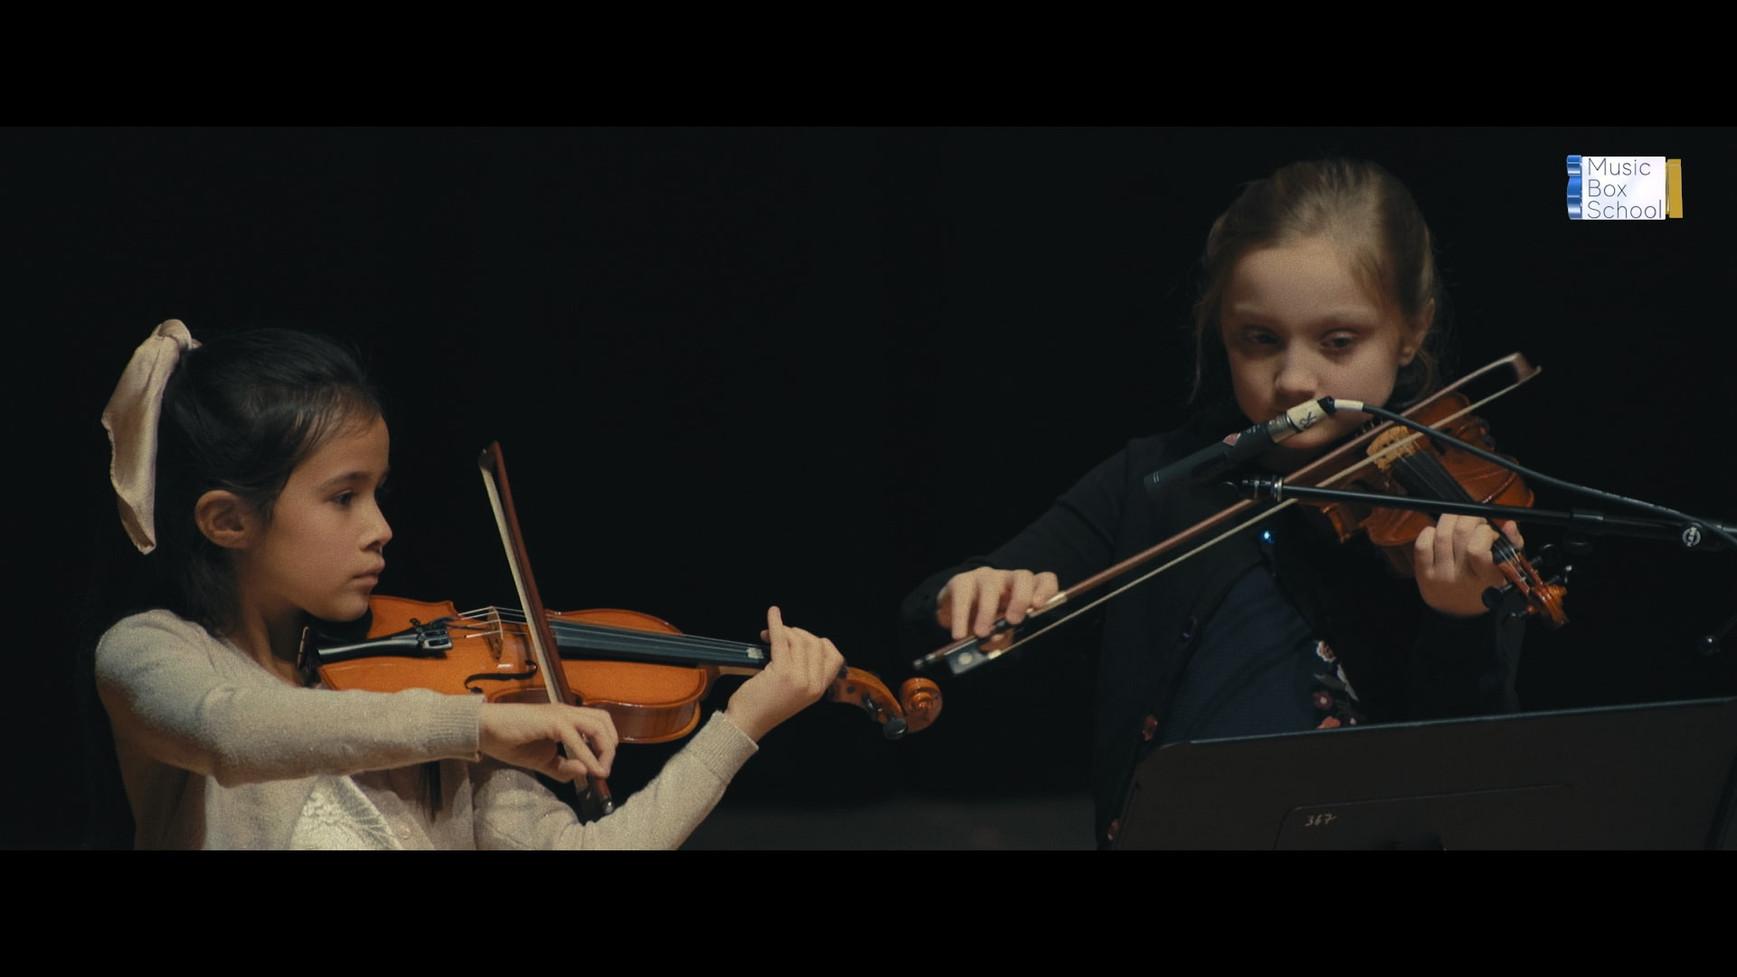 Violin lessons in Sheepshead Bay, Brooklyn